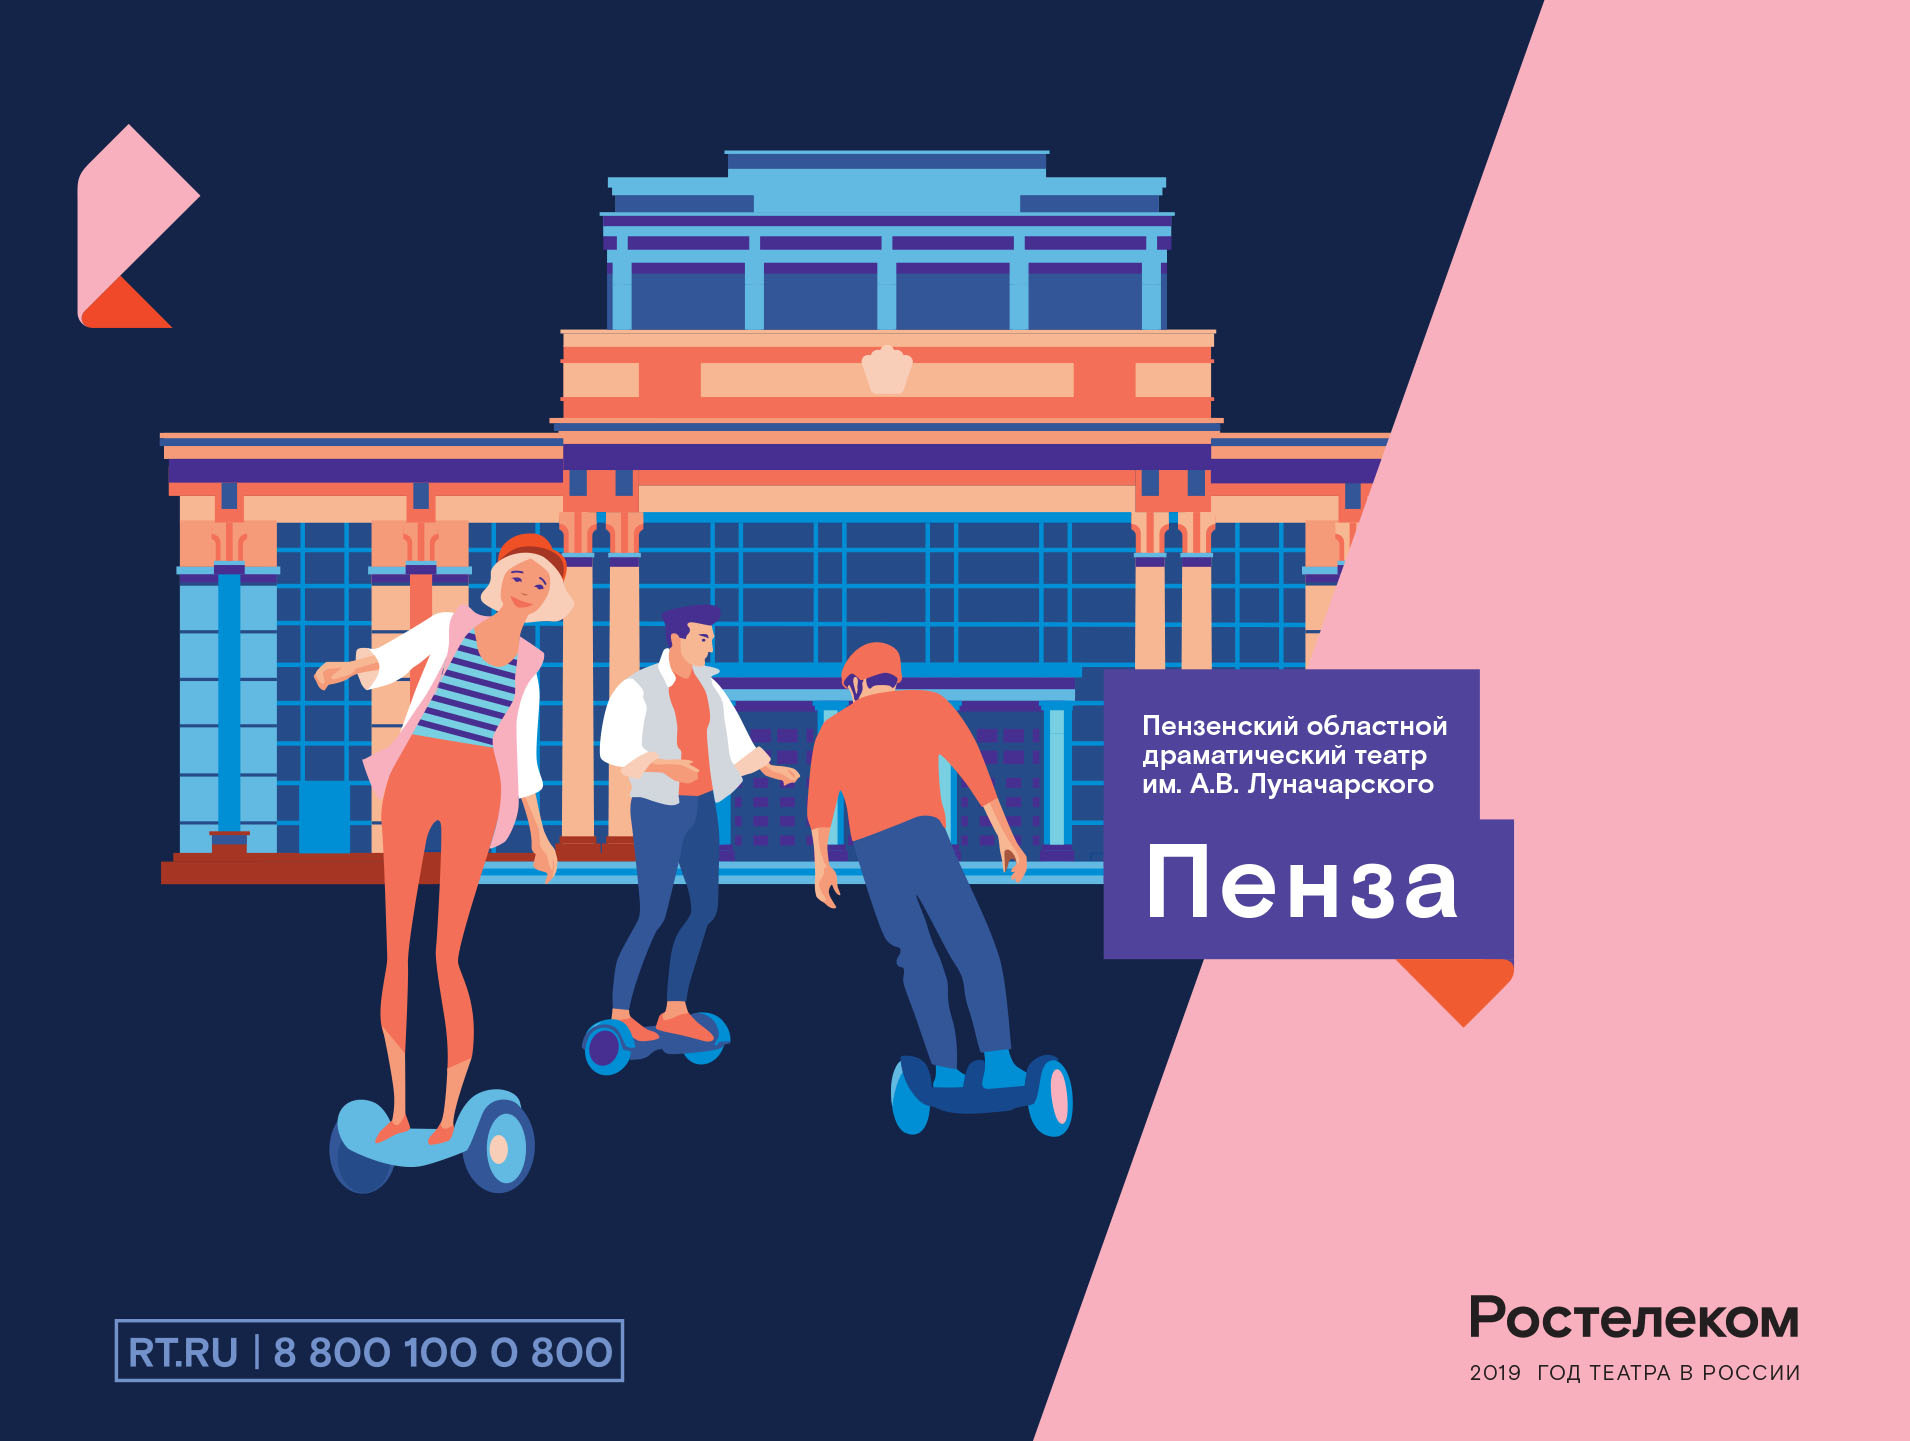 Axana zasorina rostelecom1 copy 11